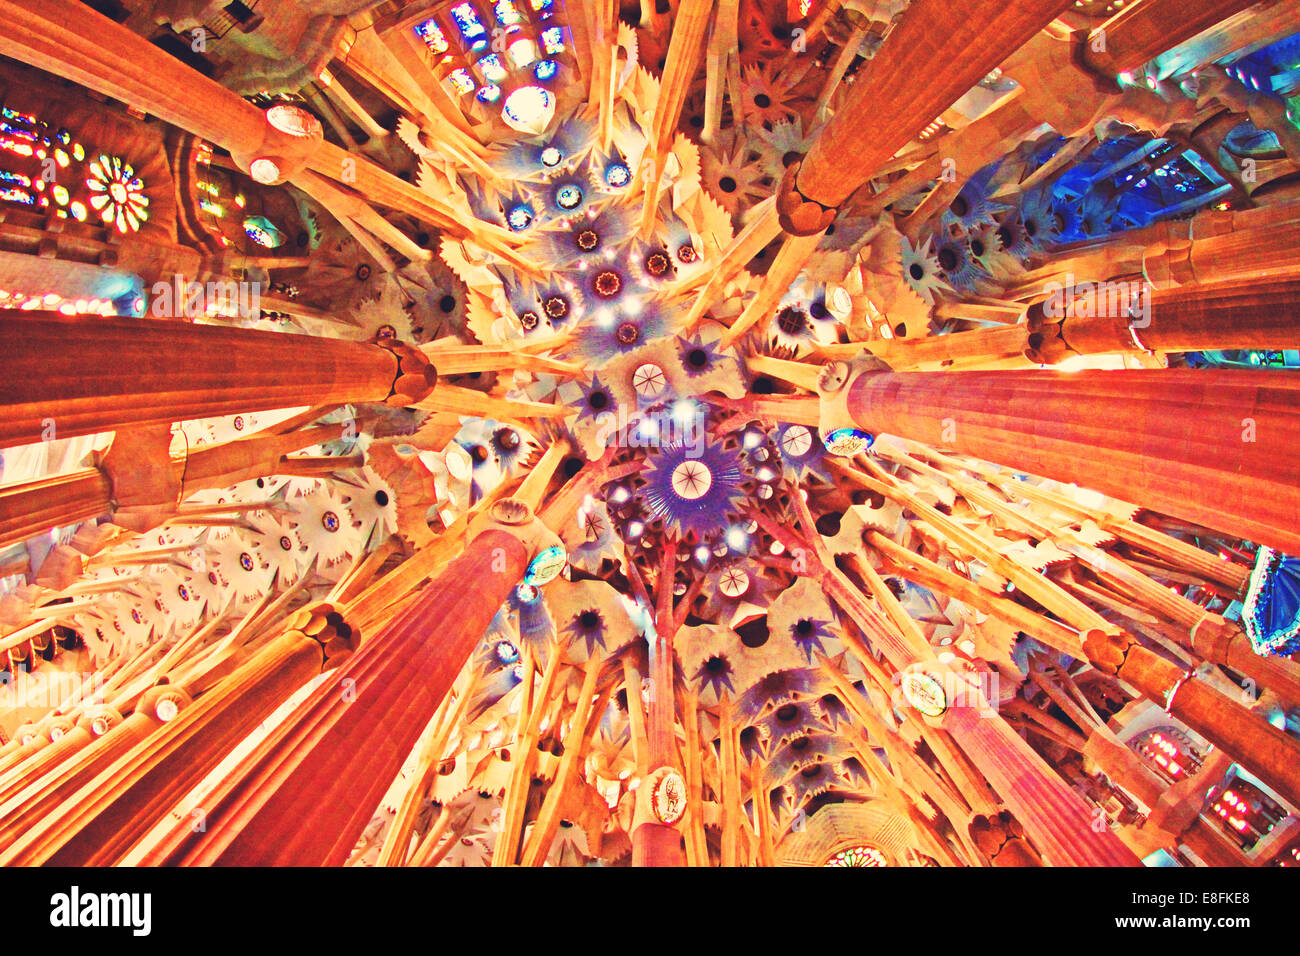 España, Barcelona, Sagrada Familia, techo Imagen De Stock